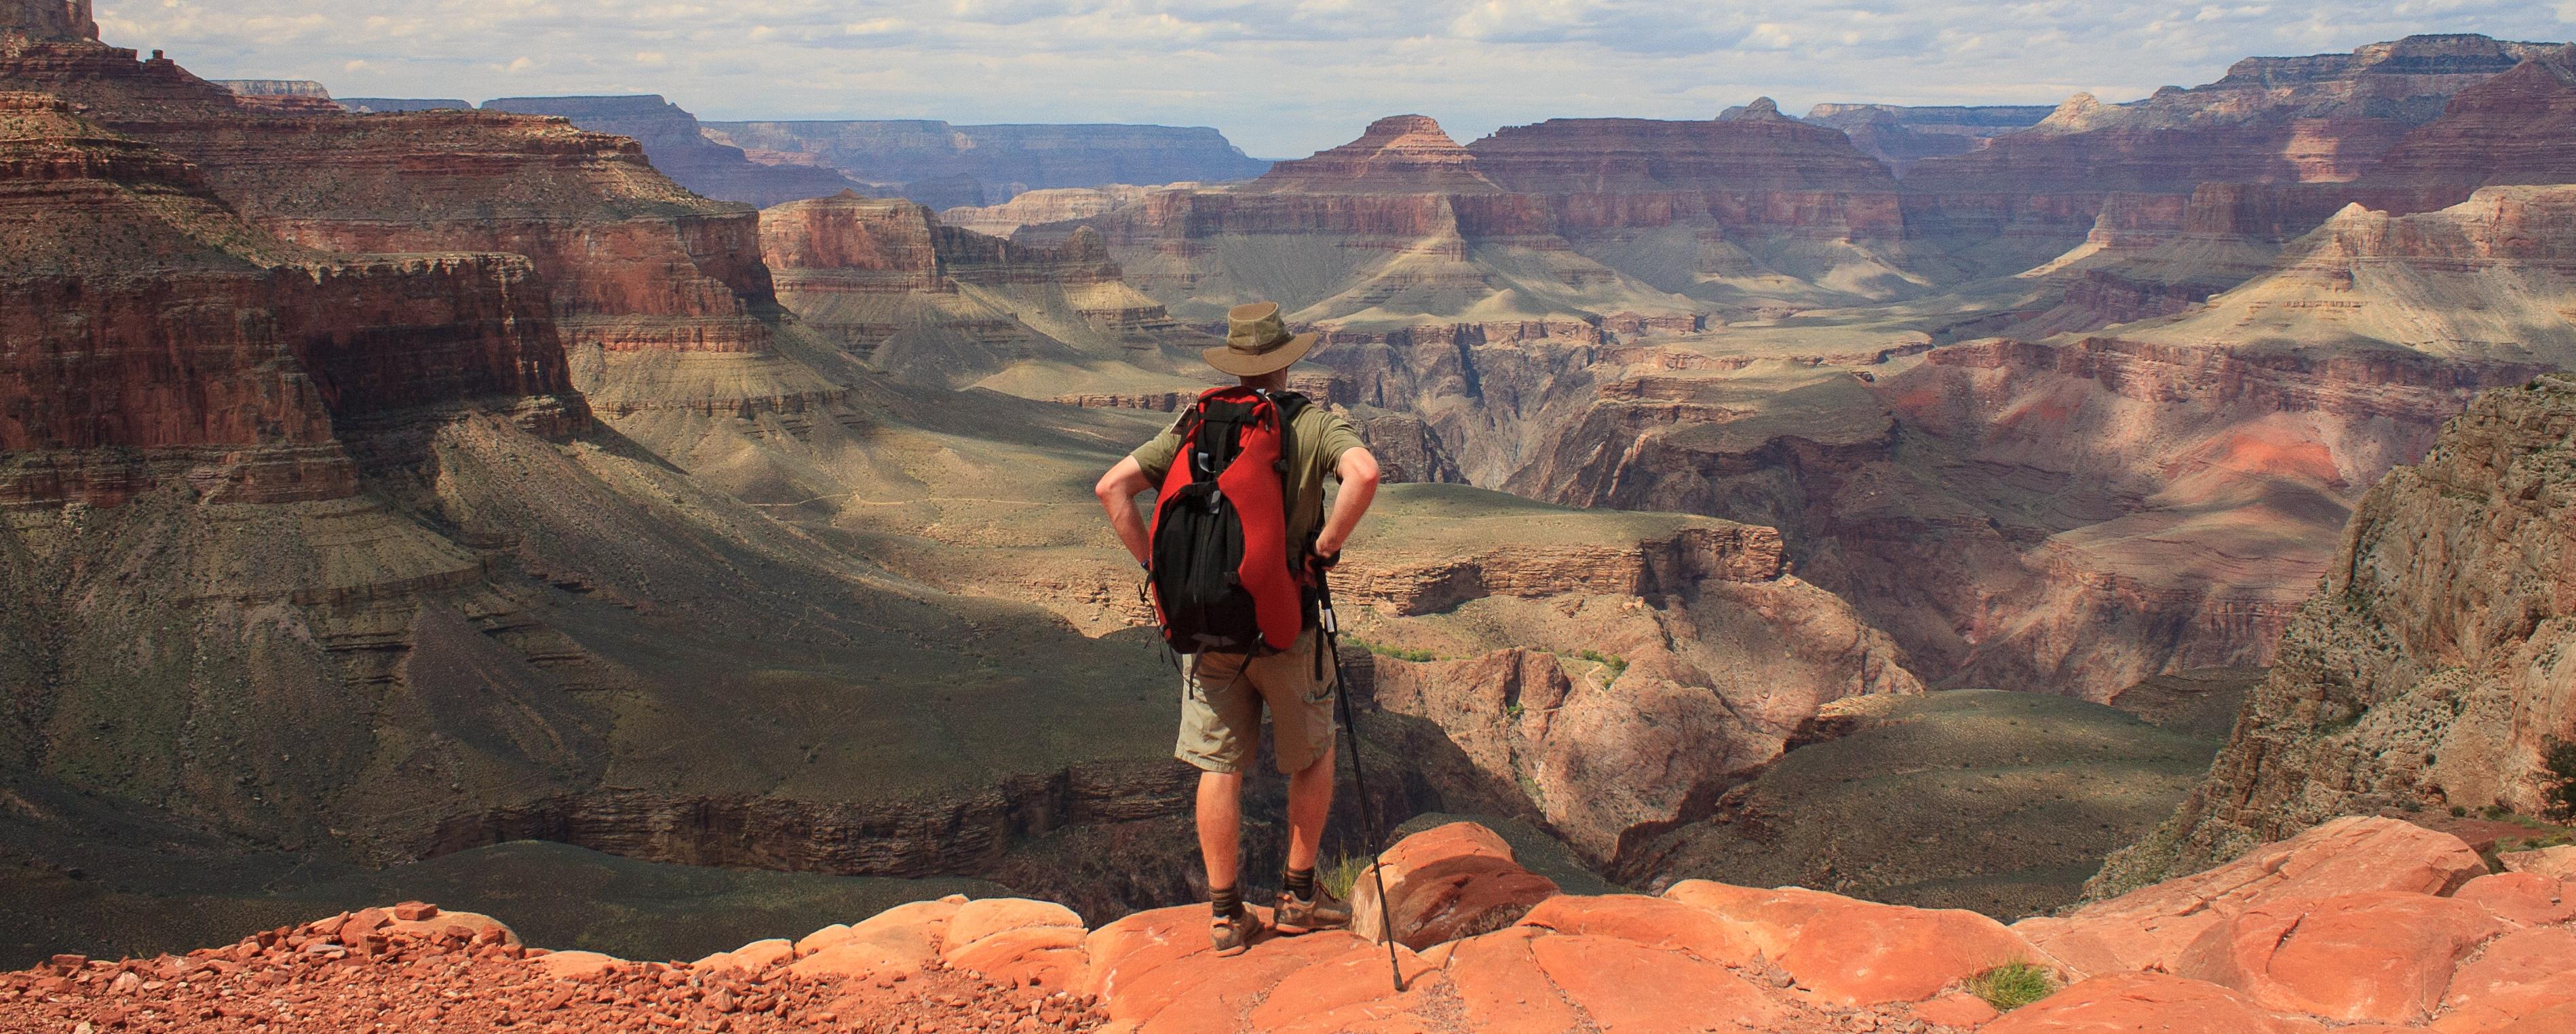 Grand Canyon Sedona Solo View.JPG